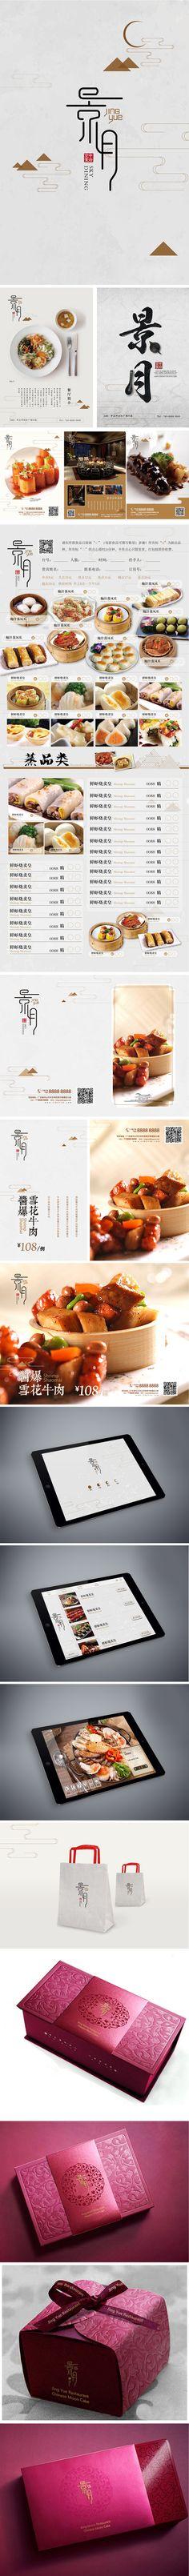 From the internet Ci Design, Word Design, Menu Design, Layout Design, Dm Poster, Poster Design, Chinese Typography, Typography Logo, Asian Design